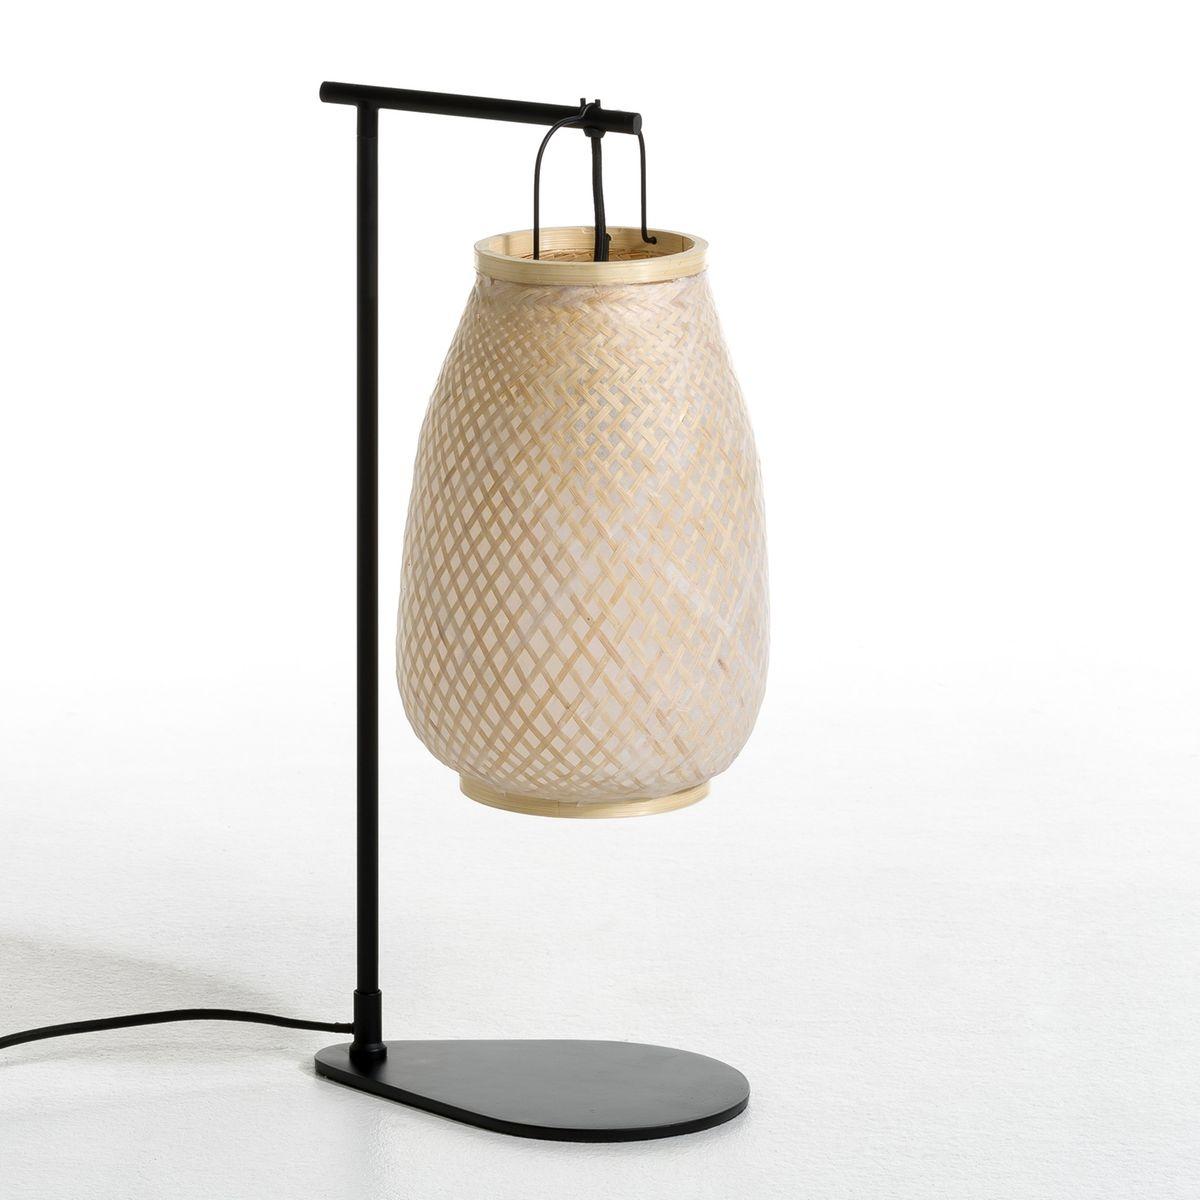 Lampe à poser Titouan, design E. Gallina